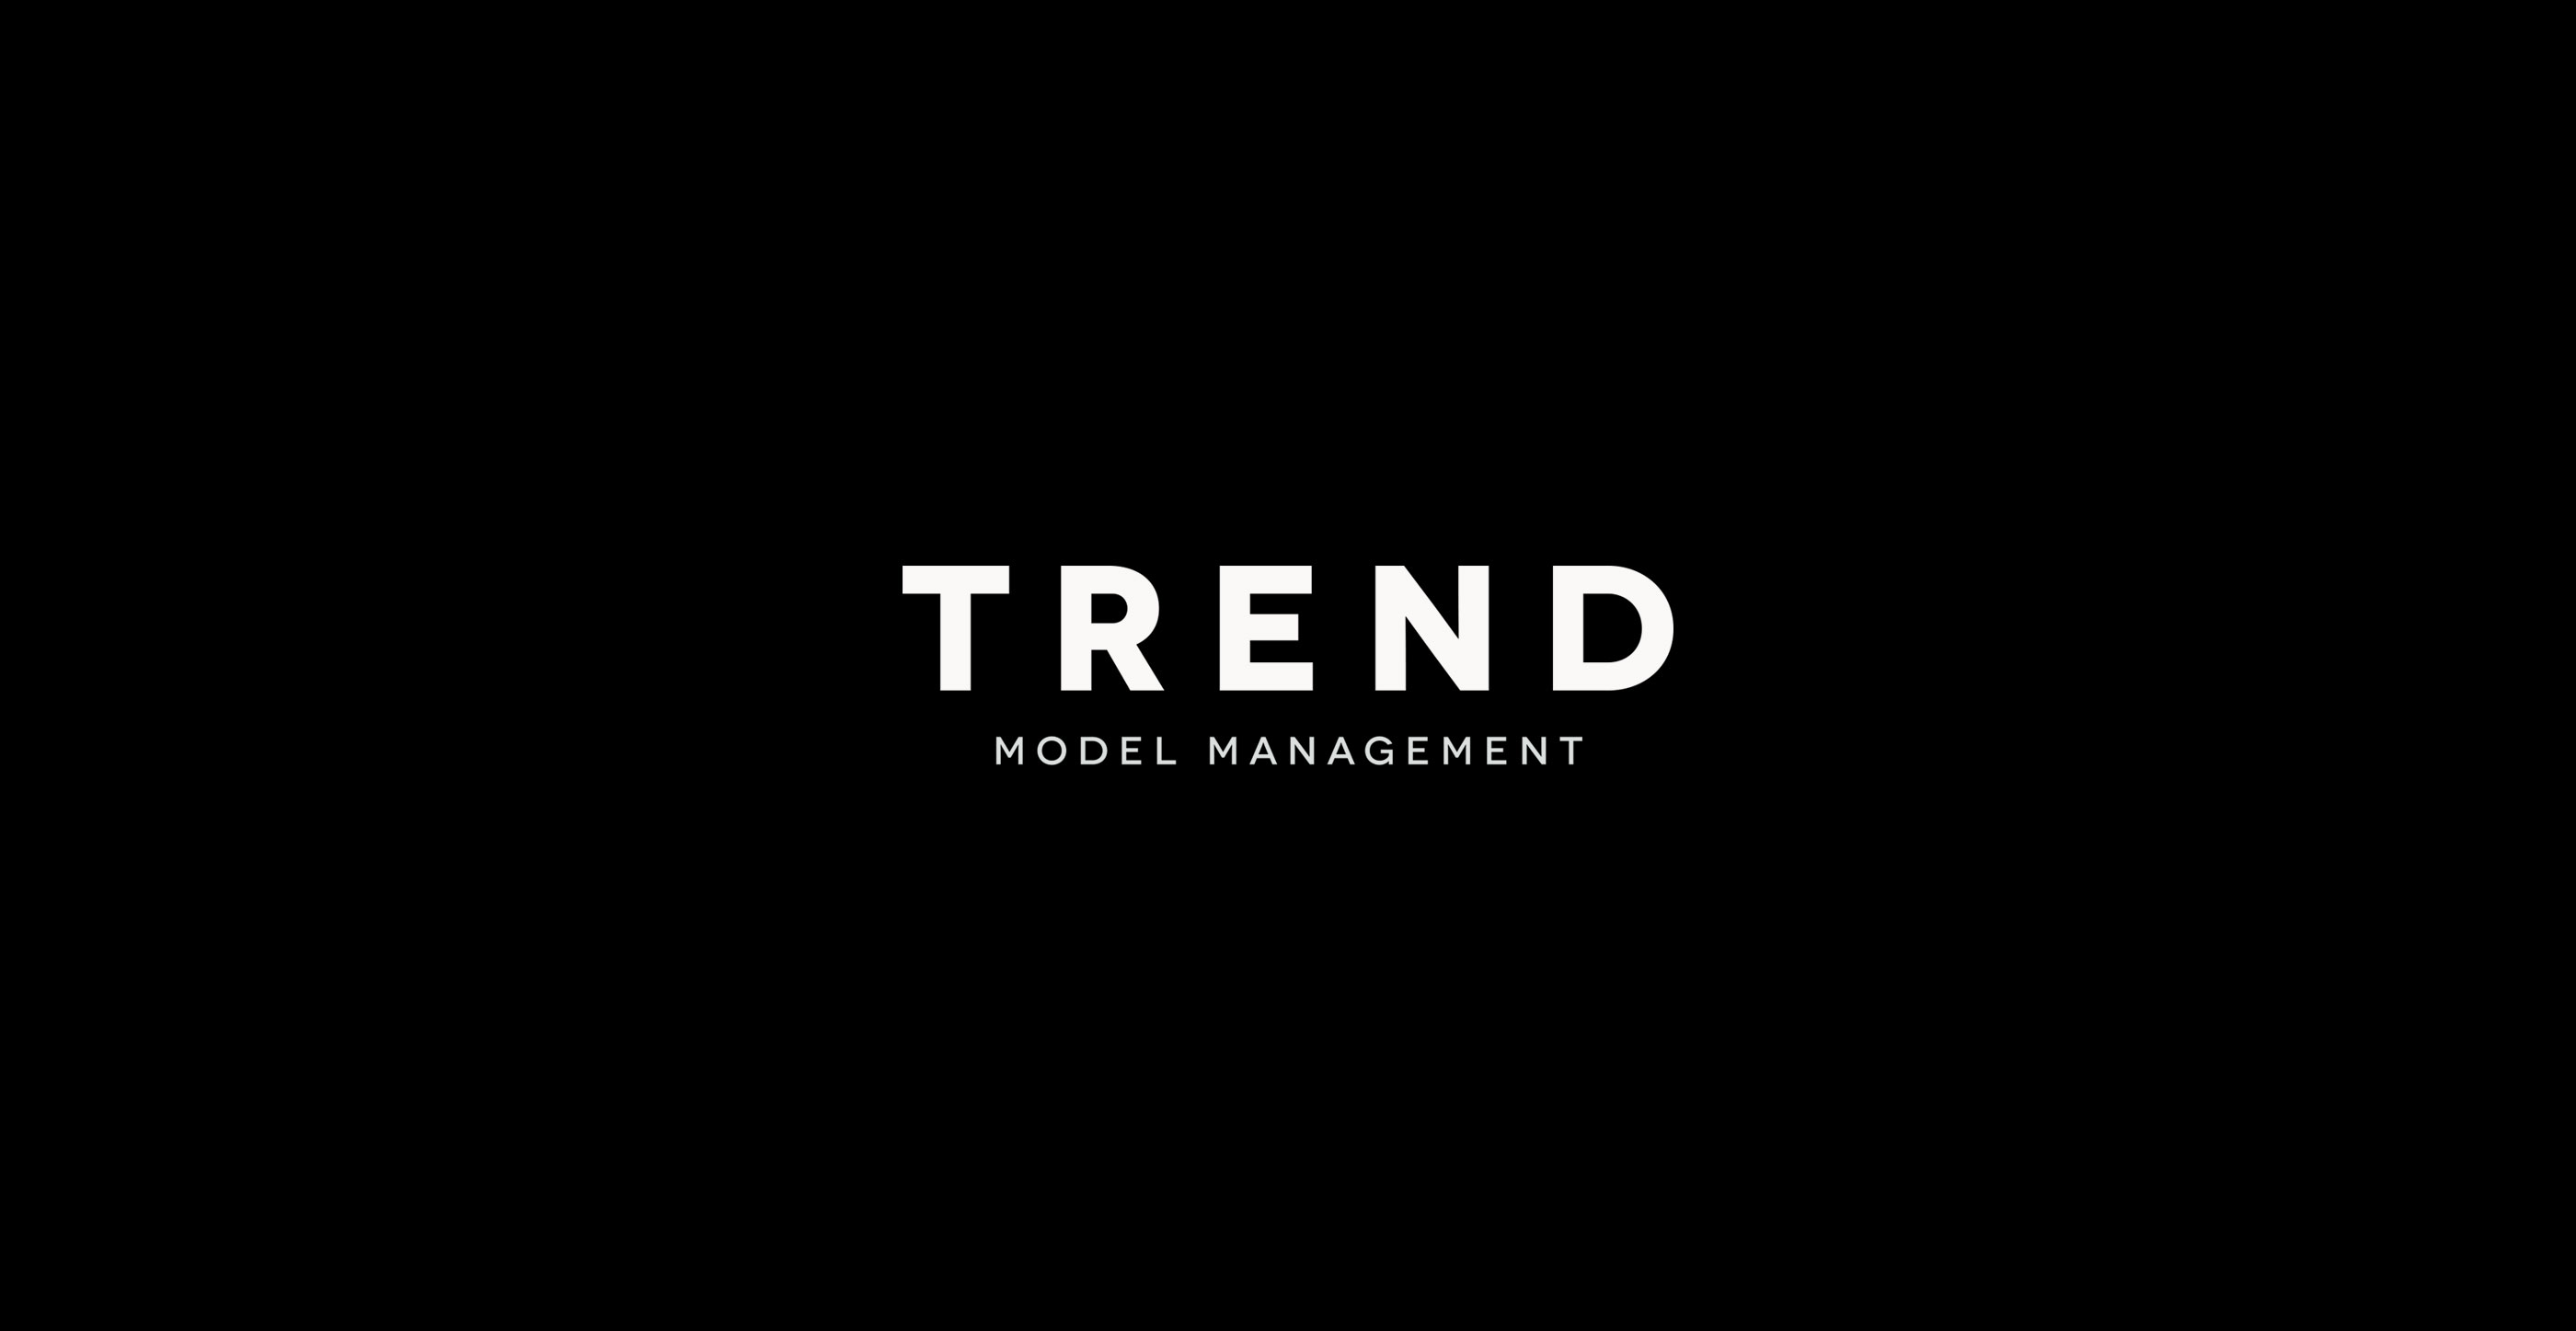 NOTONSATURDAY_TREND01